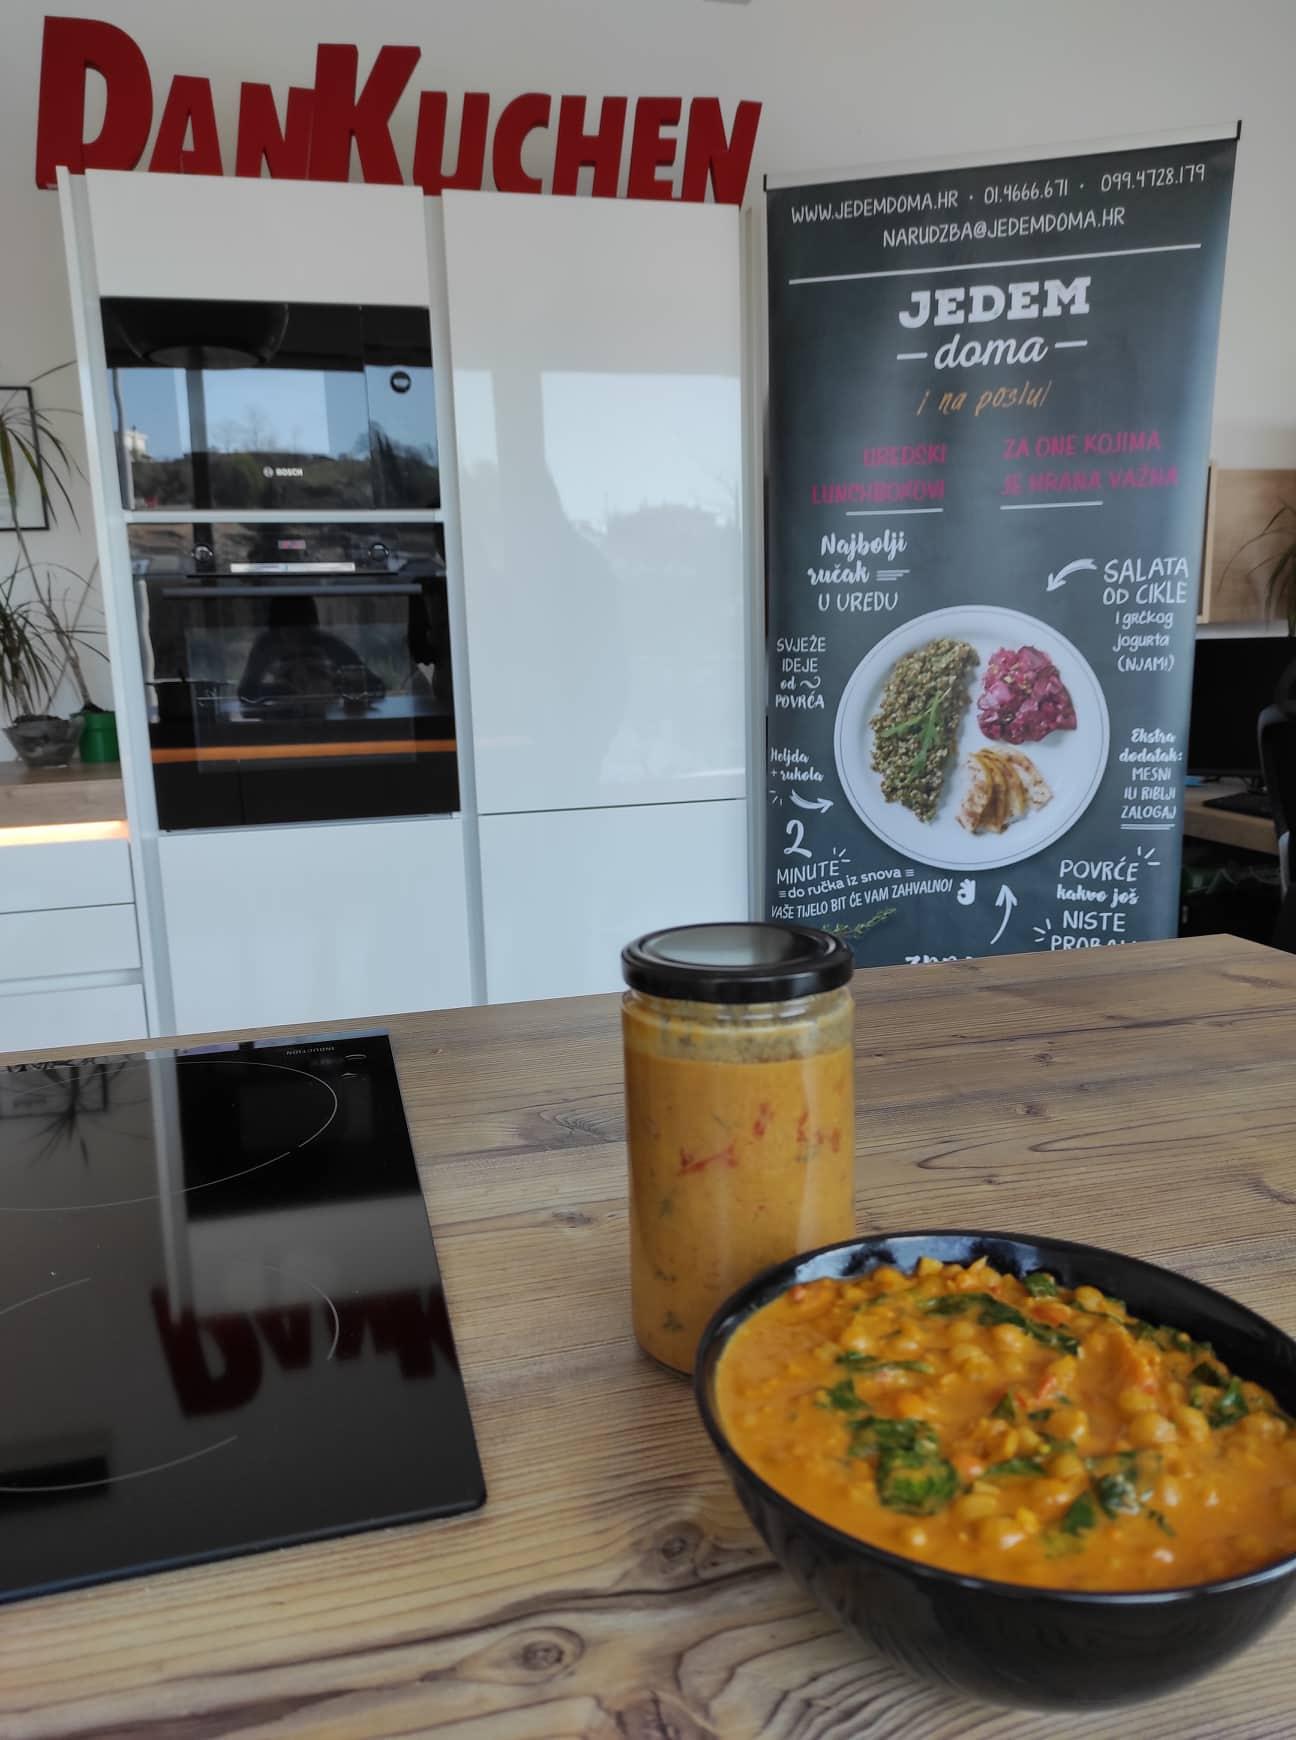 Extravagant chef: curry od slanutka i špinata